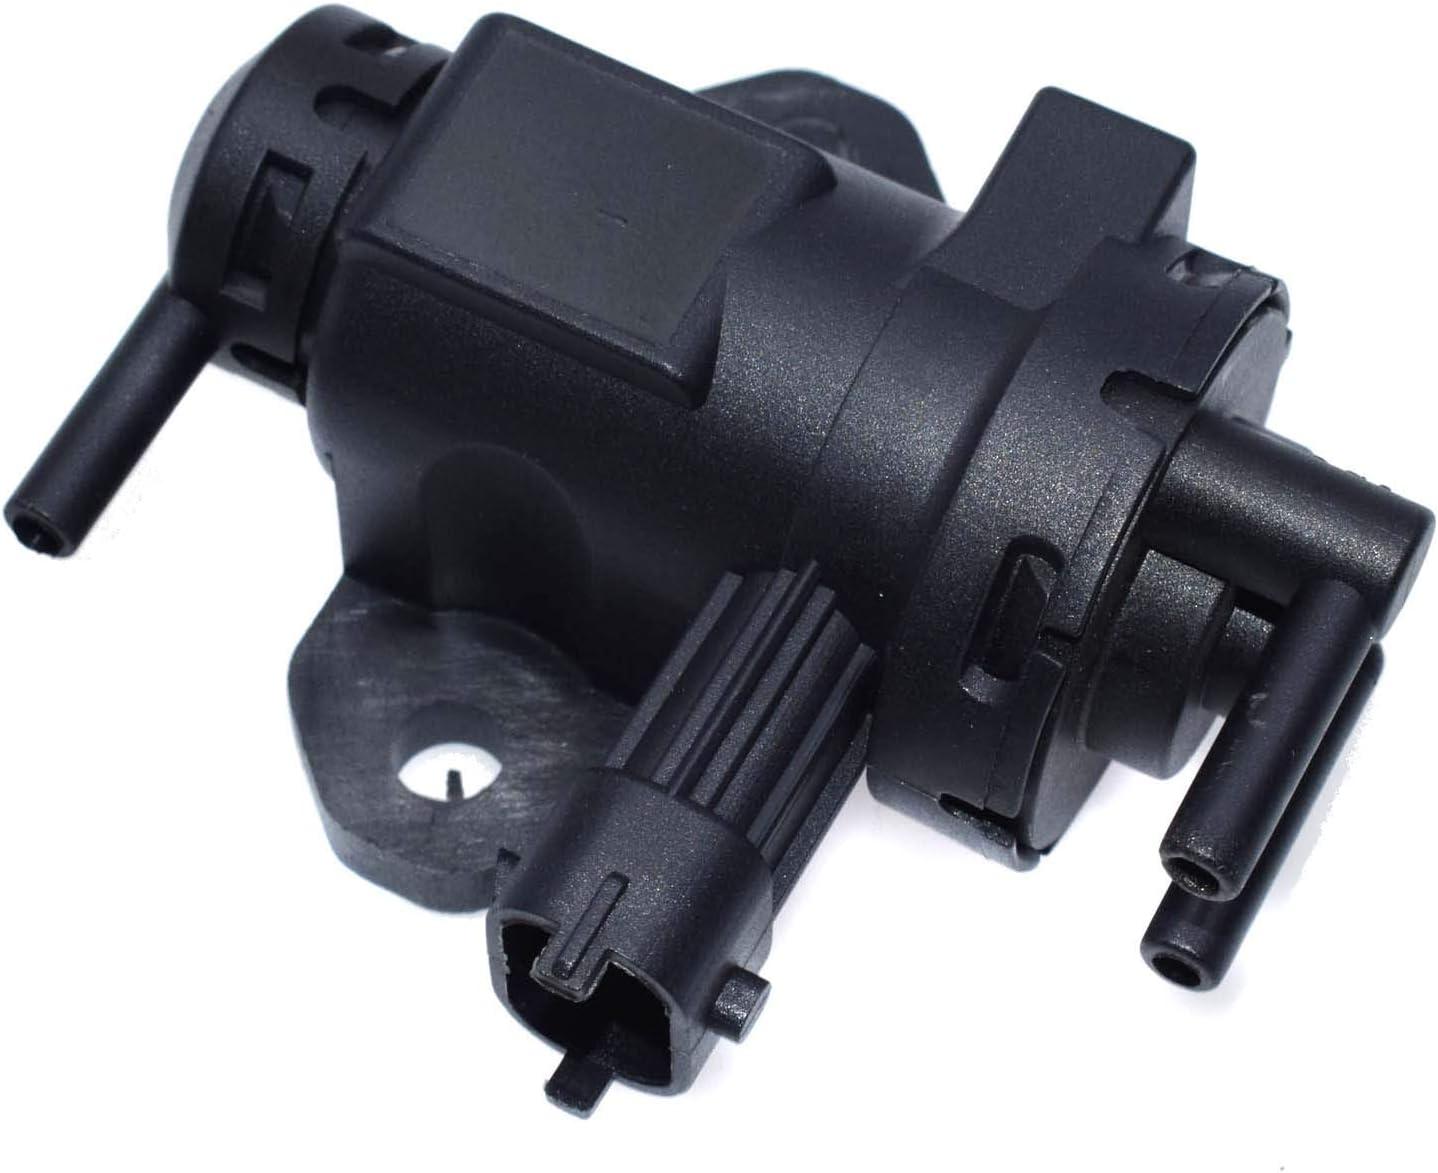 Turbocharger Boost Solenoid Valve 93174808 For Bt50 Ford Popular Chicago Mall standard Mazda P